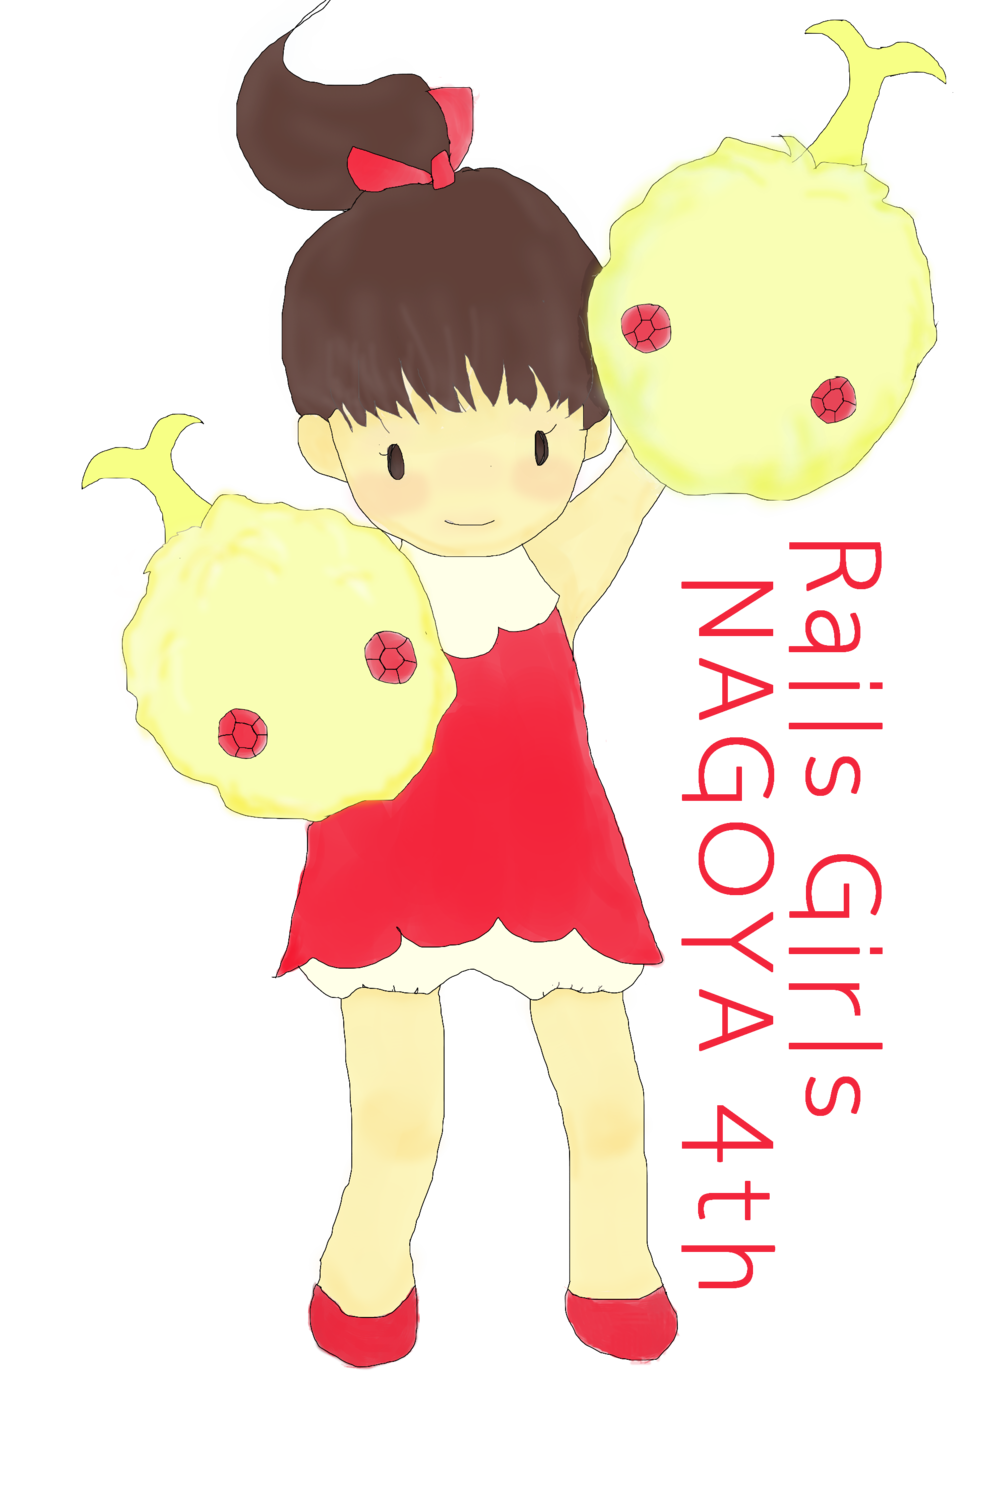 68655 normal 1513479177 20171116 01 rails girls nagoya 4th